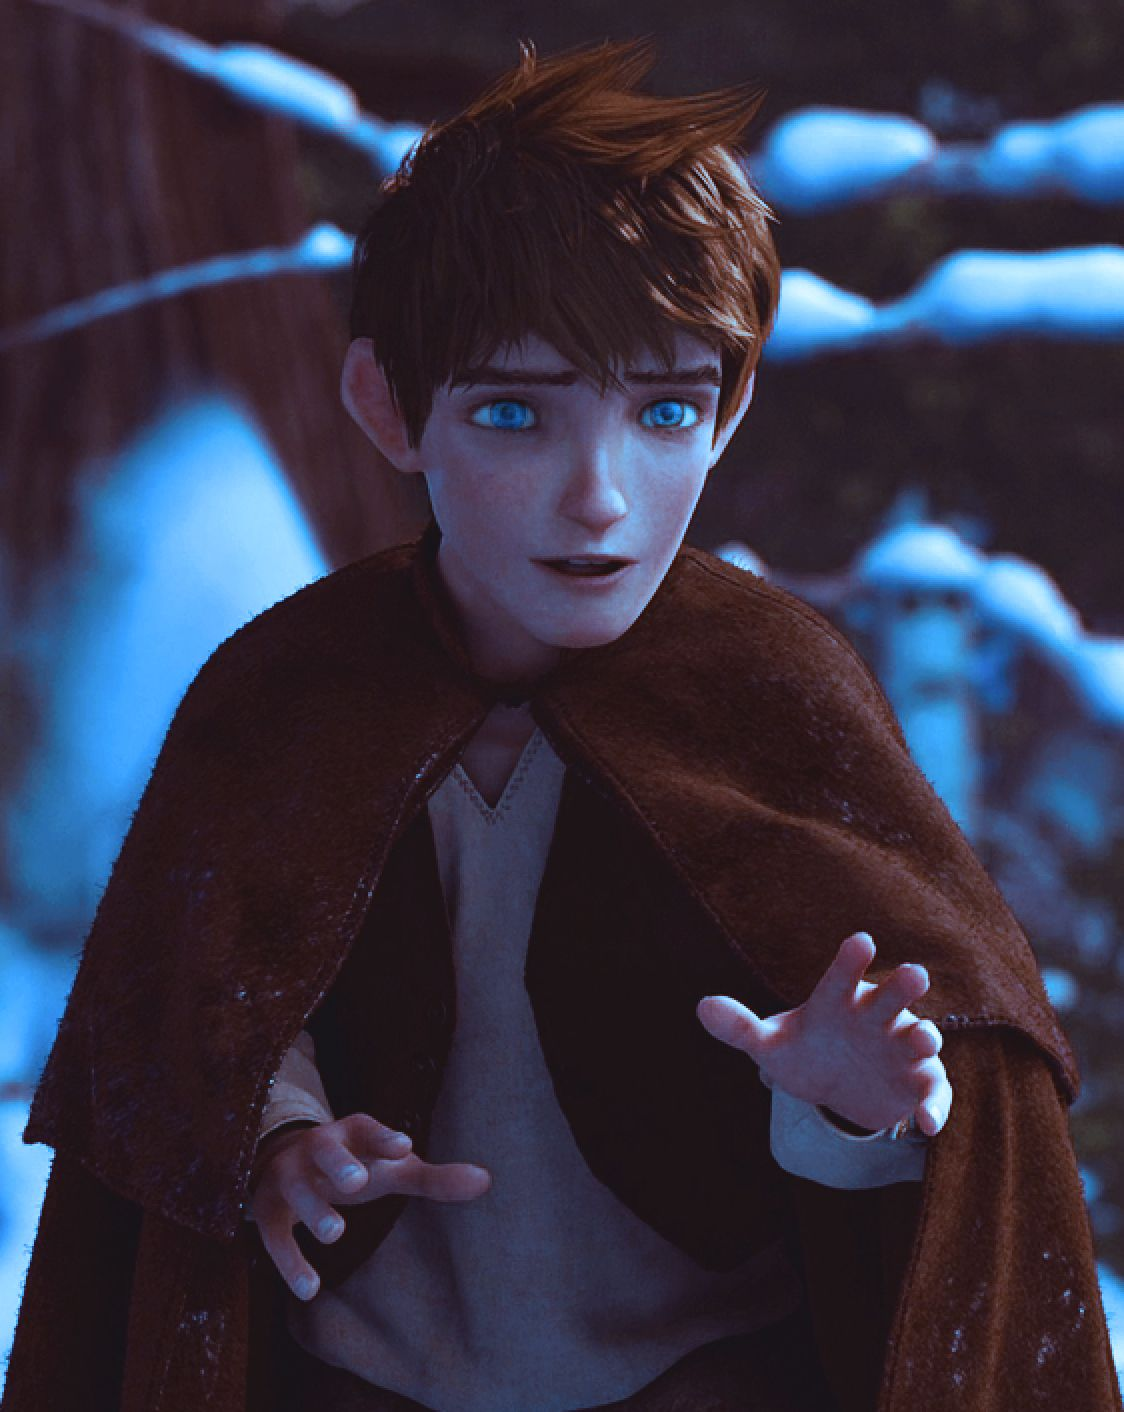 This Is My Dream Guy Brown Hair Striking Icy Blue Eyes Gorgeous